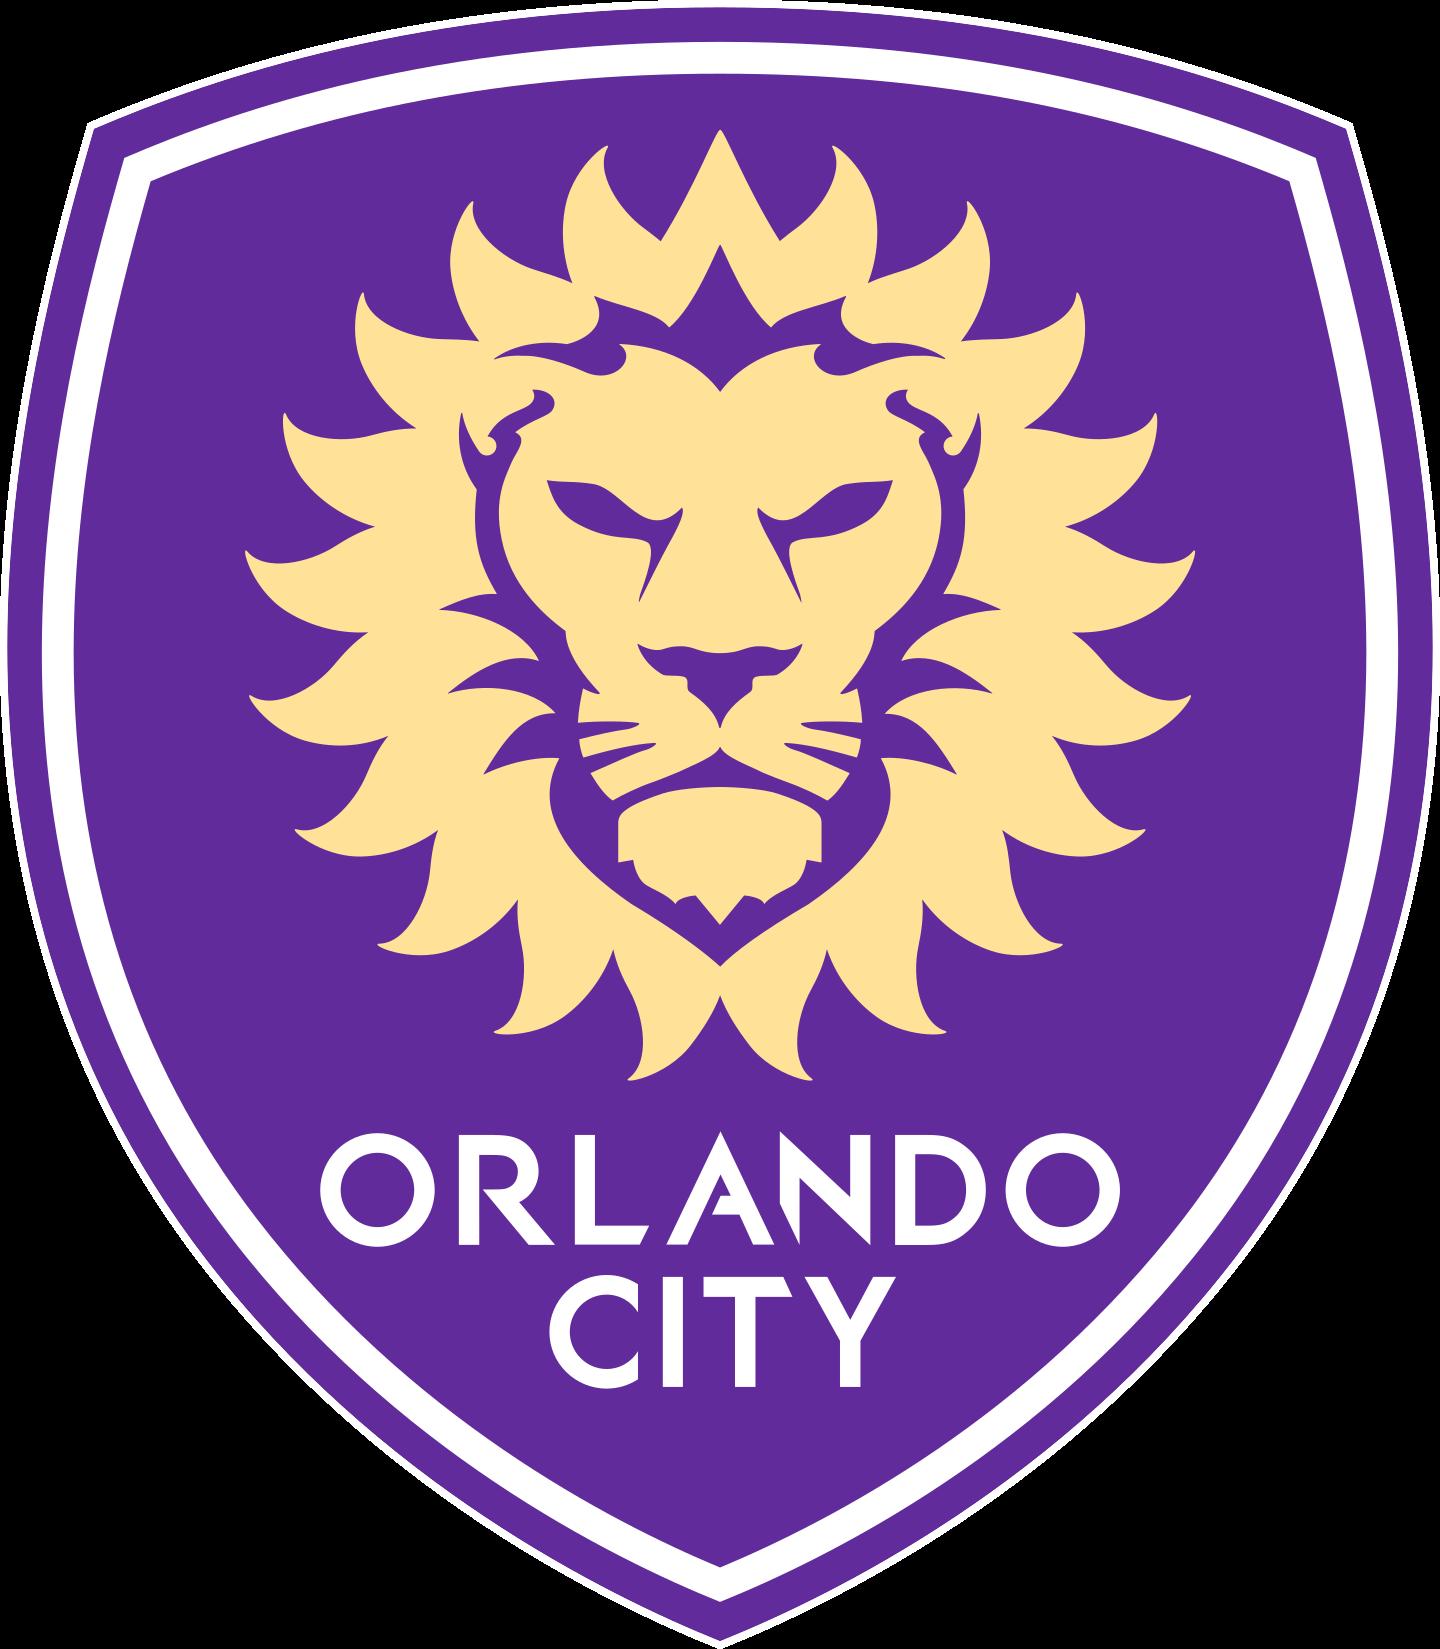 orlando city sc logo 2 - Orlando City SC Logo